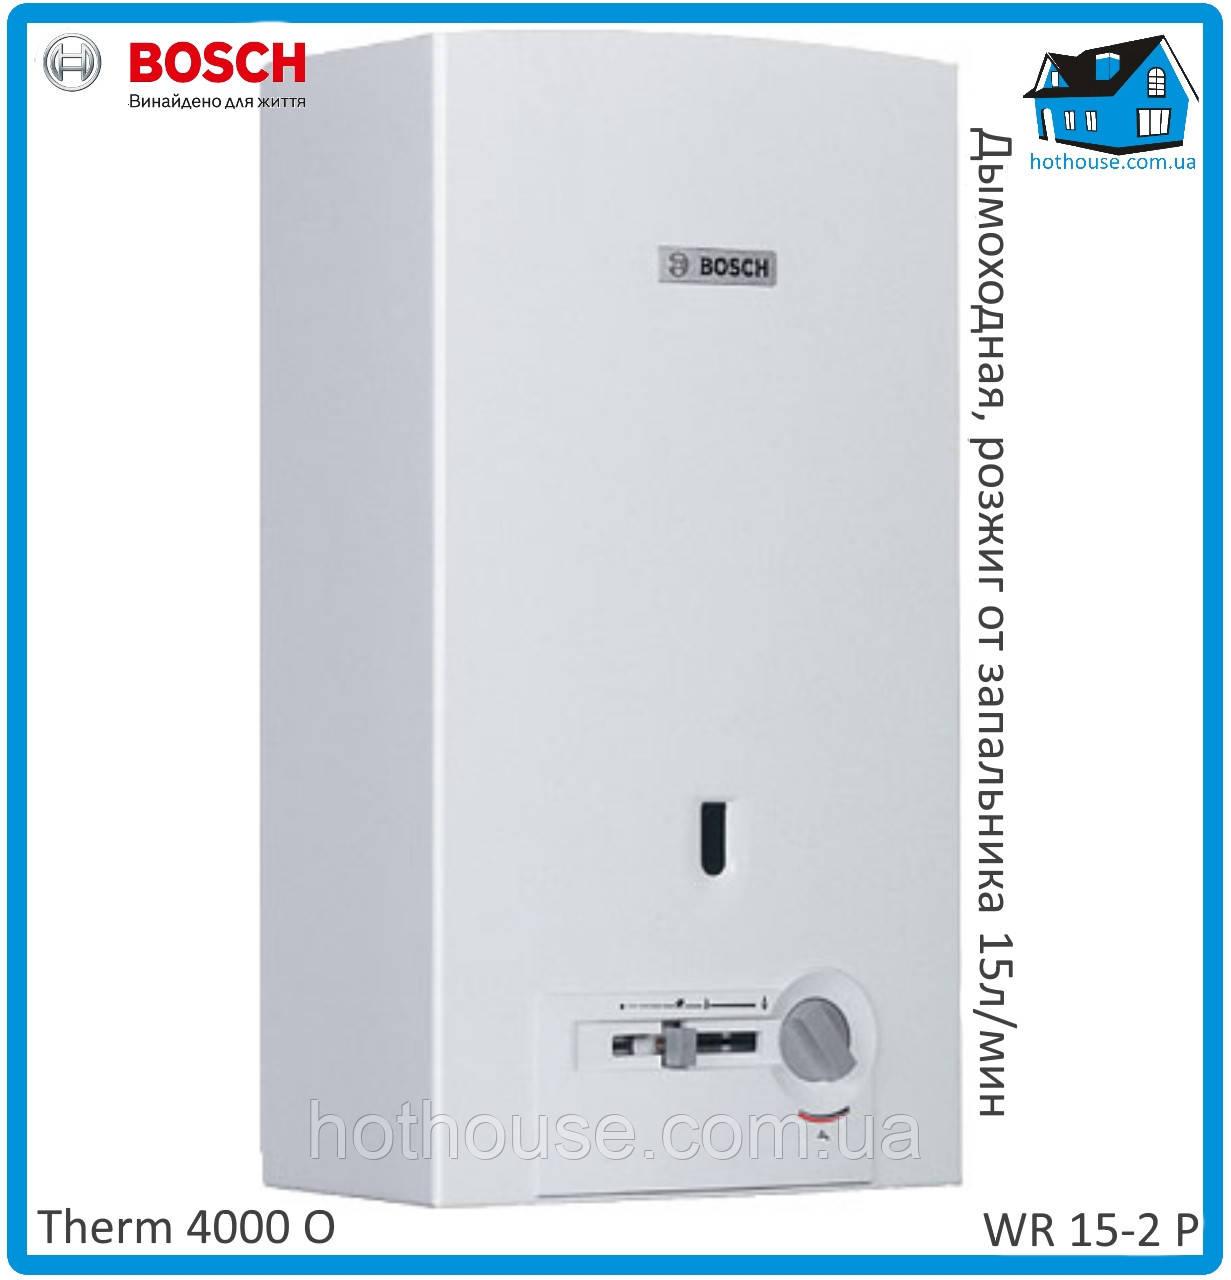 Колонка газовая Bosch Therm 4000 O WR 15-2 P